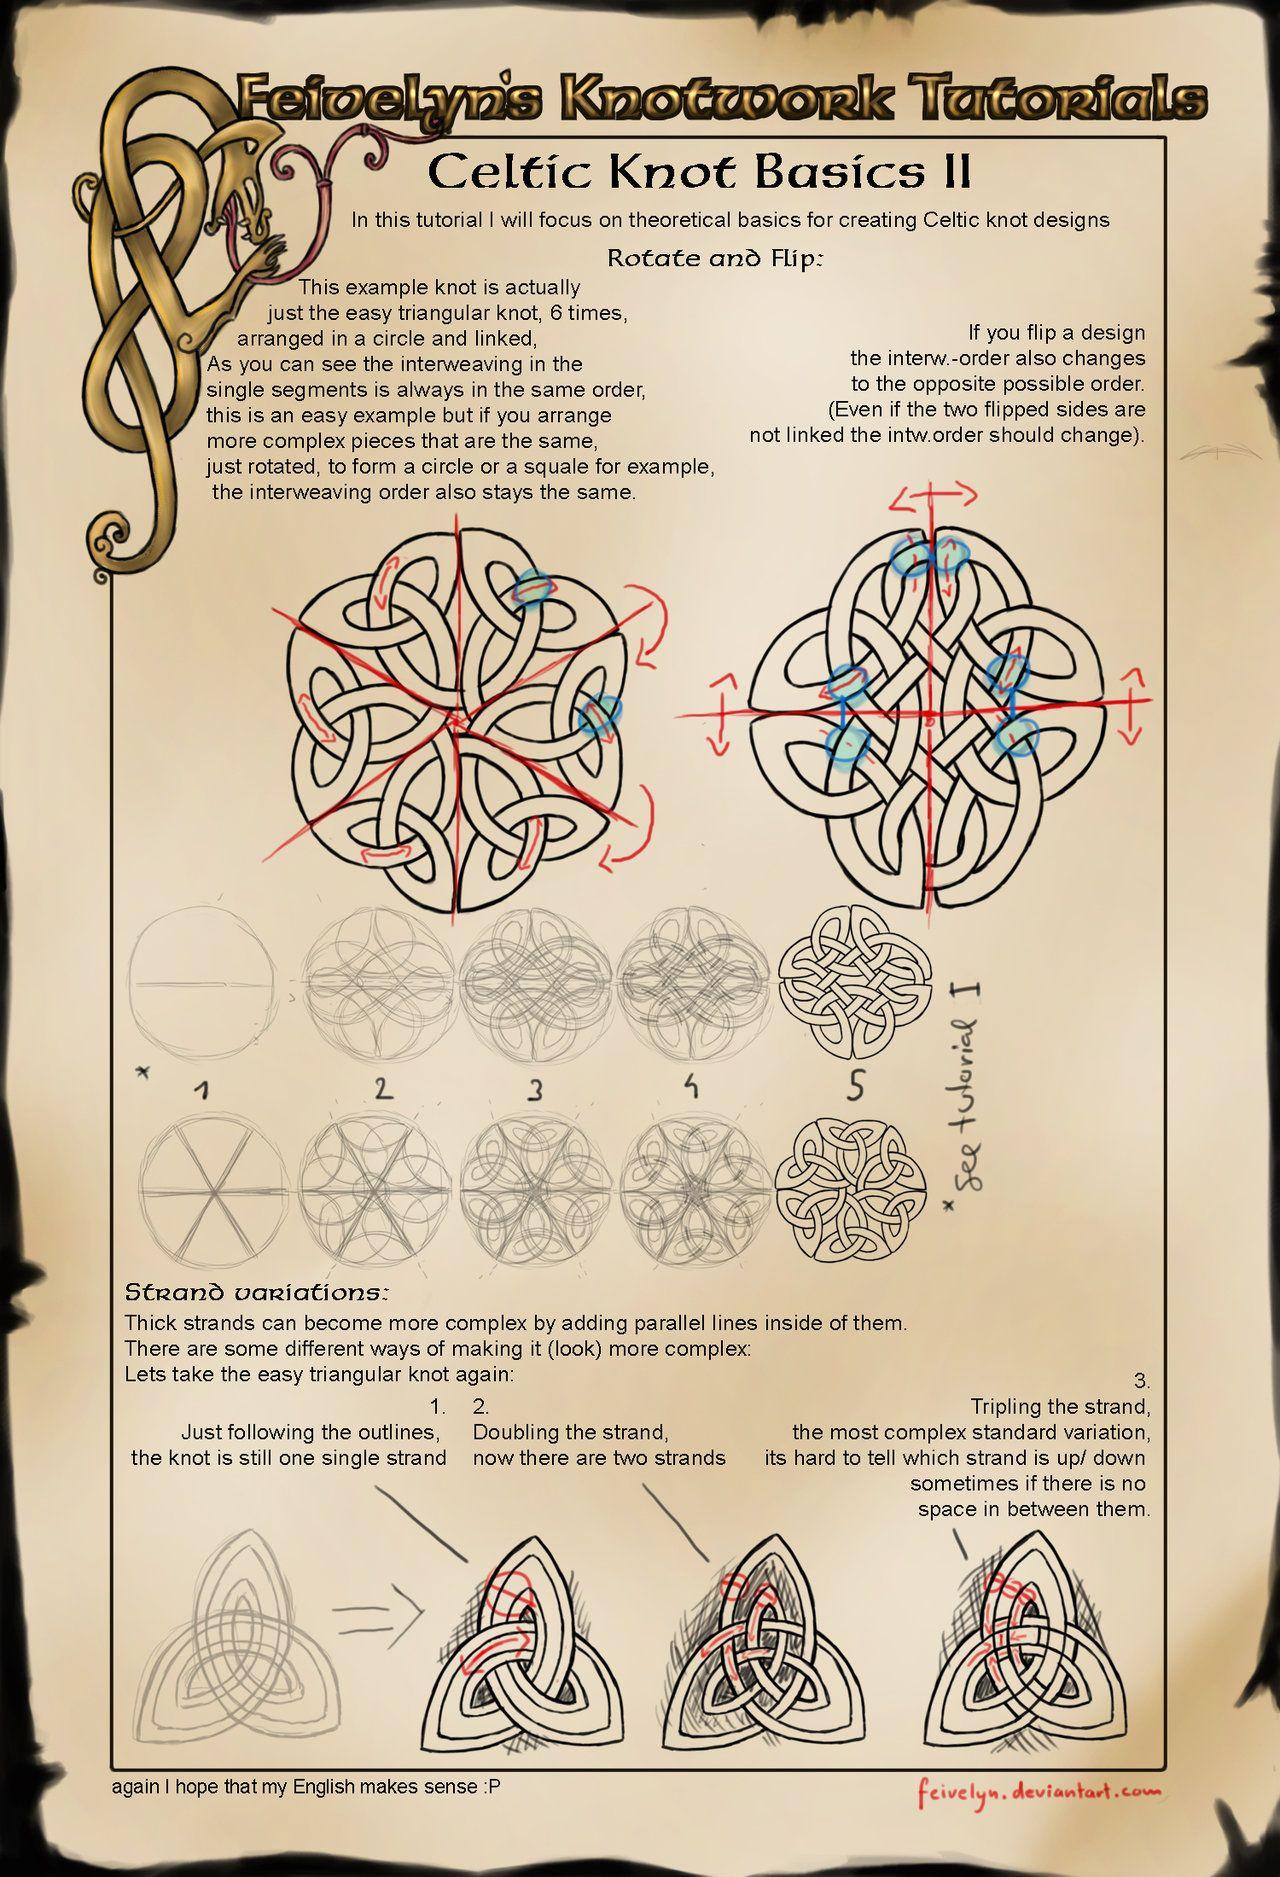 Celtic Knot Basics II By Feivelyndeviantart On DeviantArt